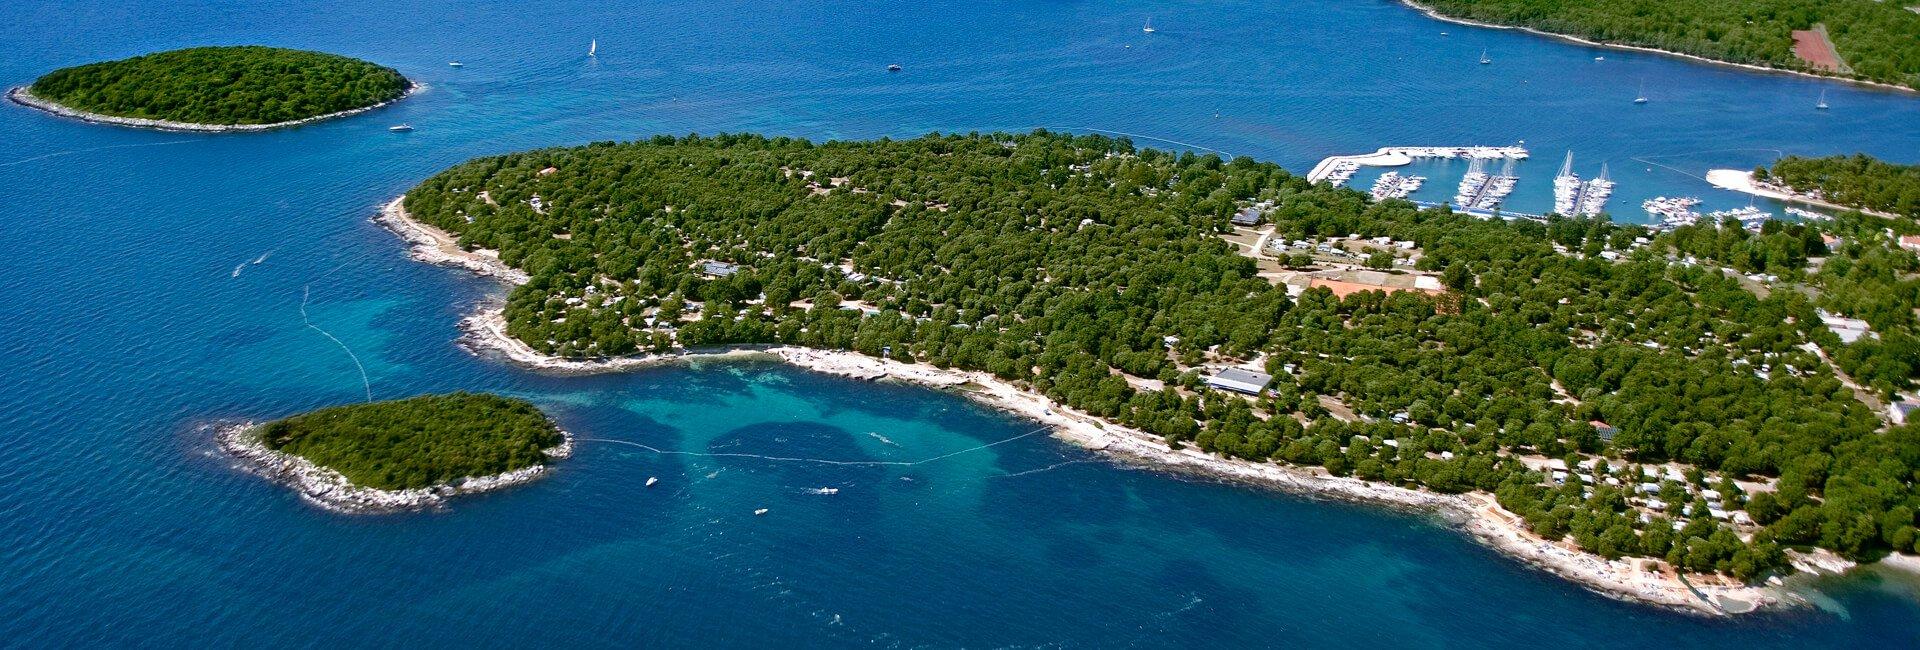 Campeggio Naturista Istra